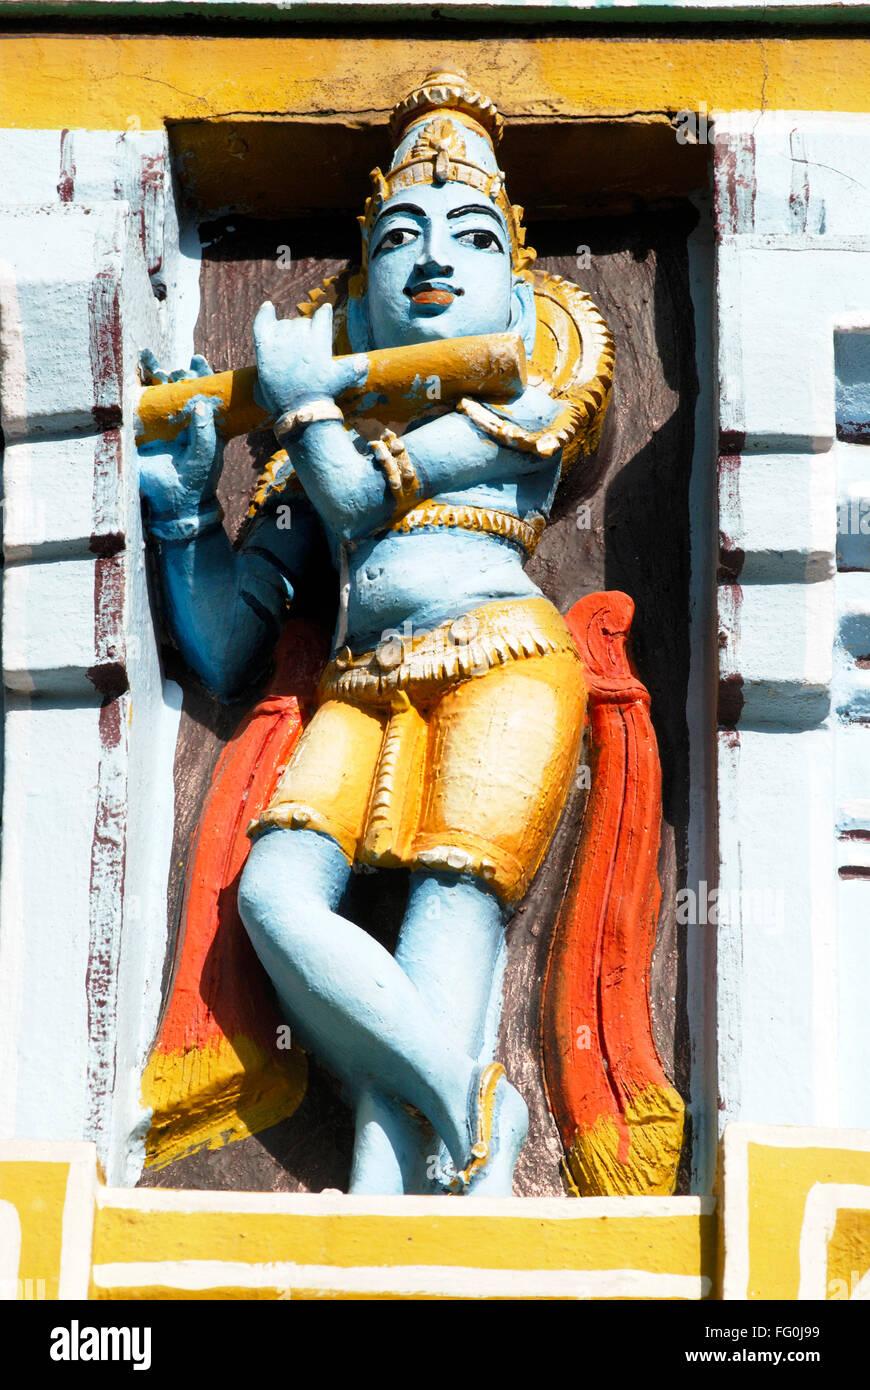 Colourfully painted statue lord Krishna playing flute bansuri facade Sri Ranganathswami temple complex Srirangam - Stock Image